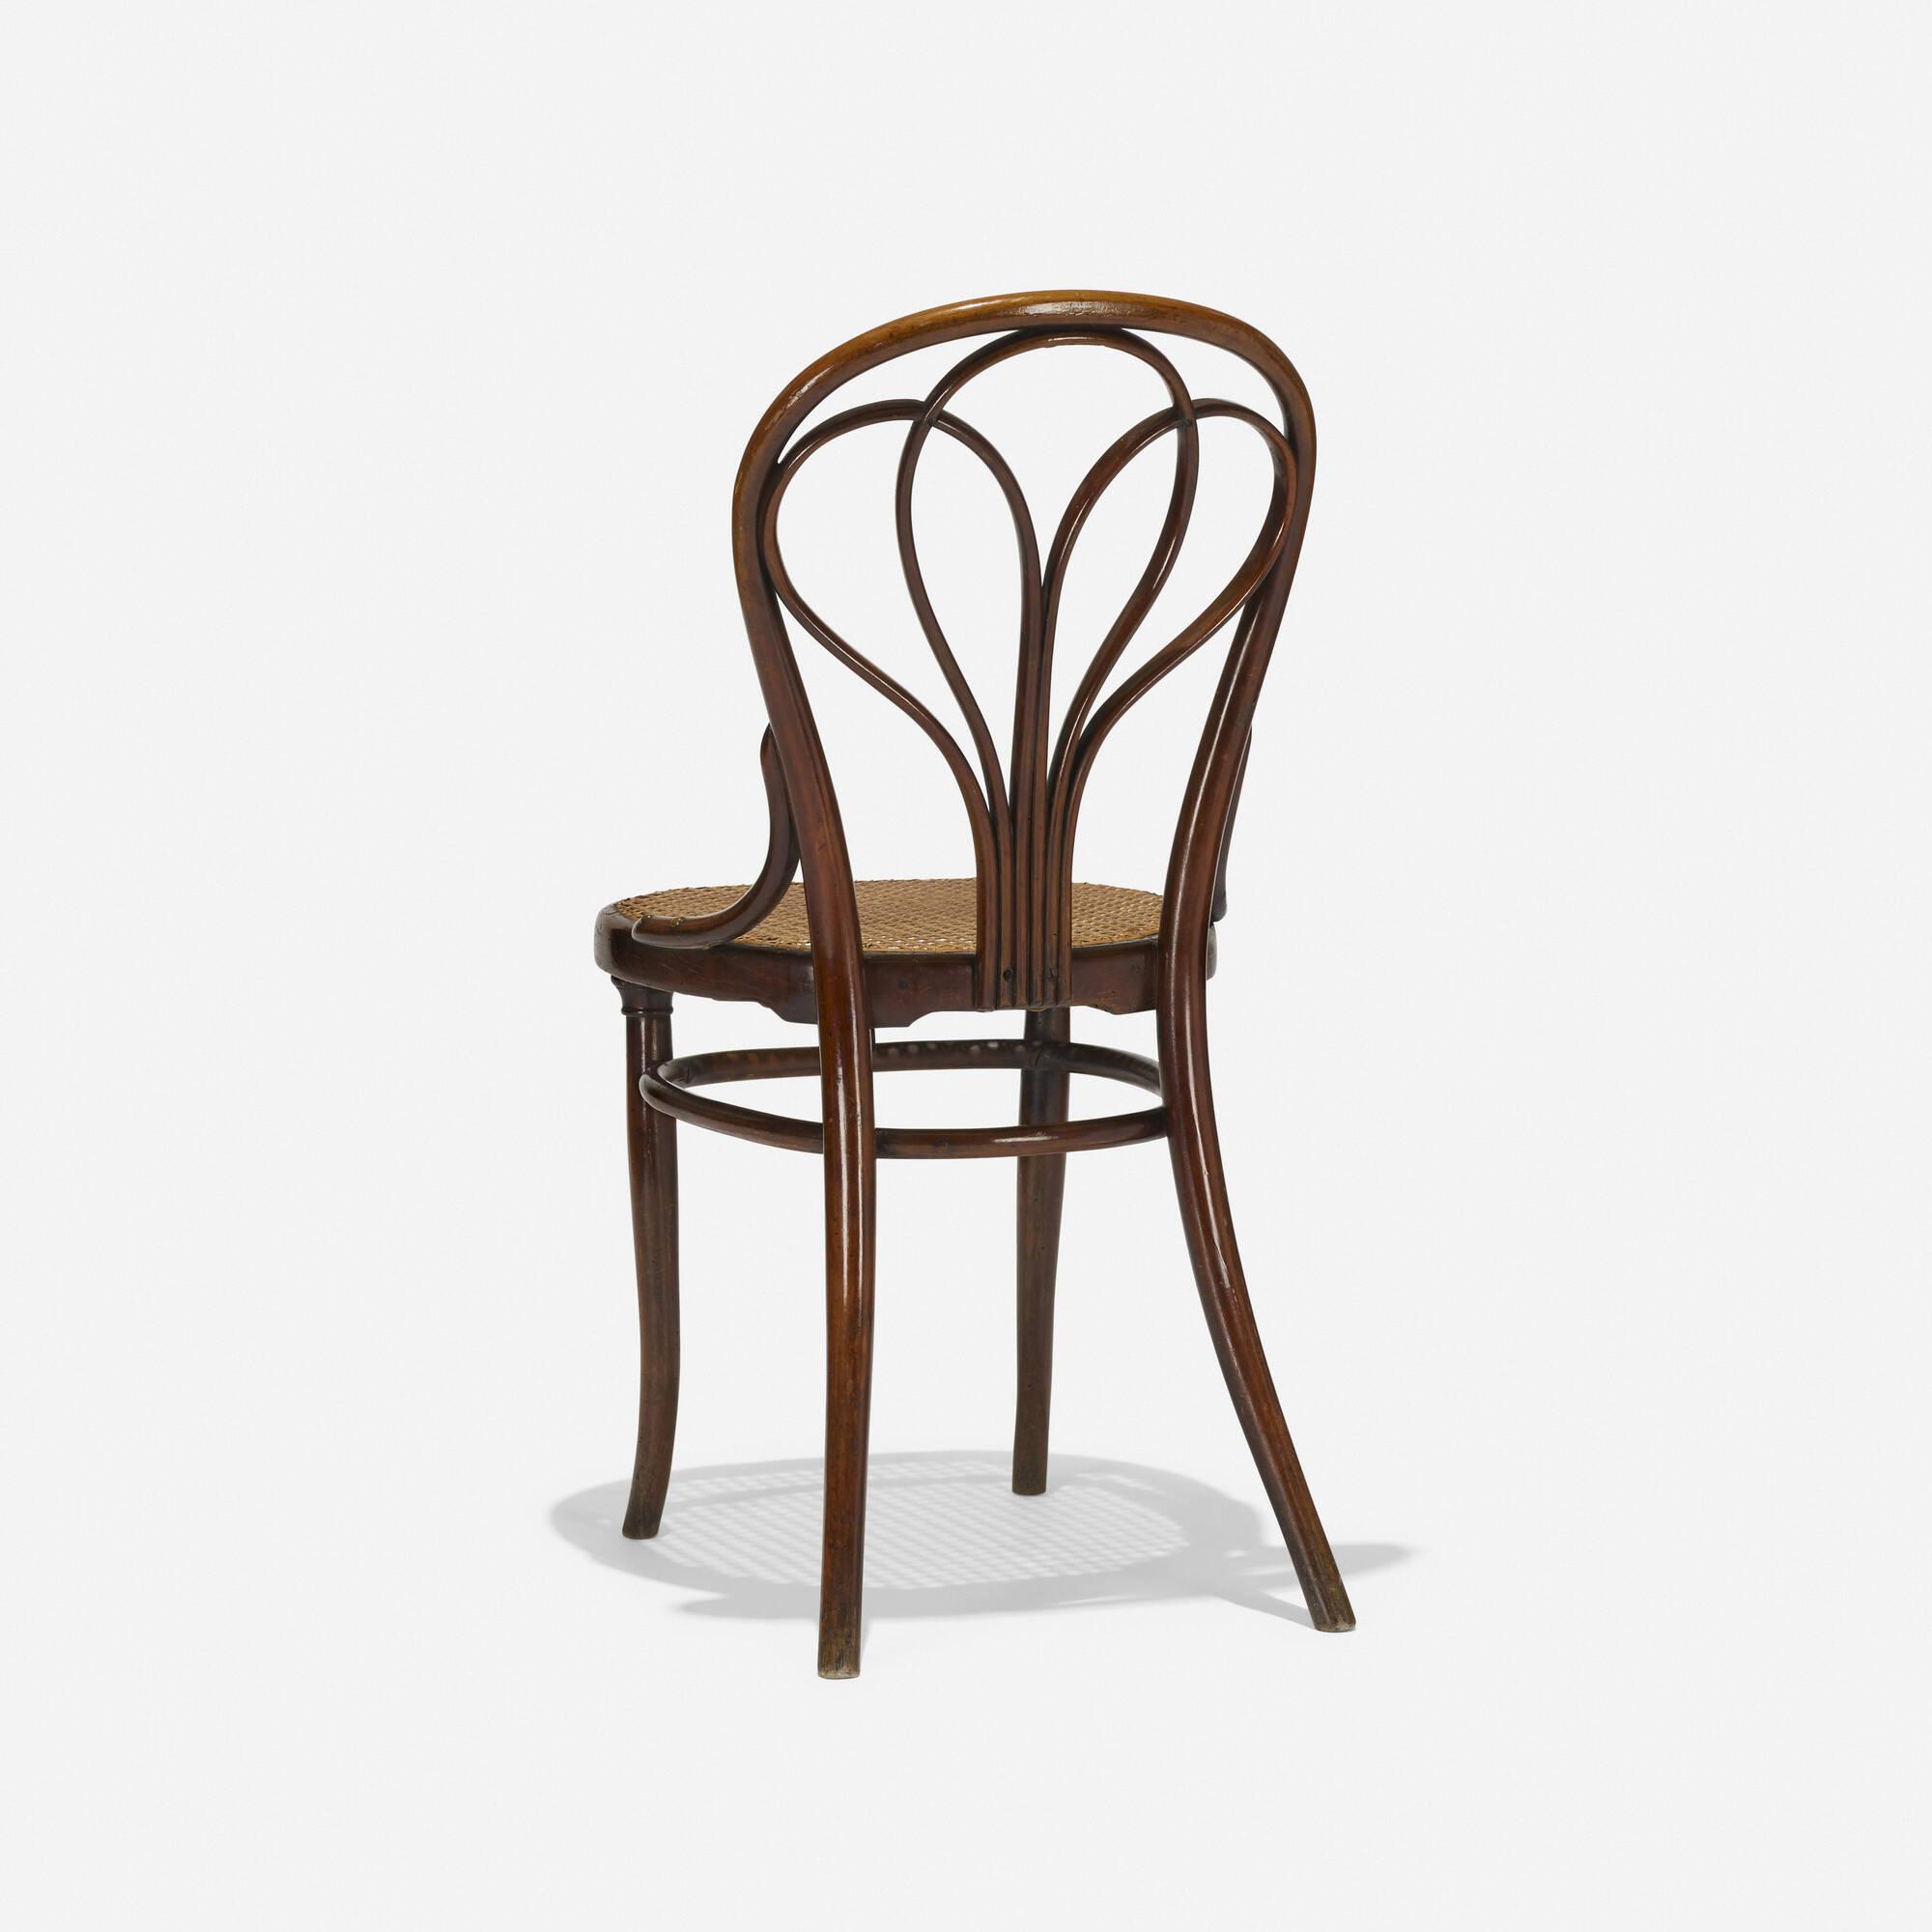 410: Gebrüder Thonet / chair, model no. 25 (1 of 3)